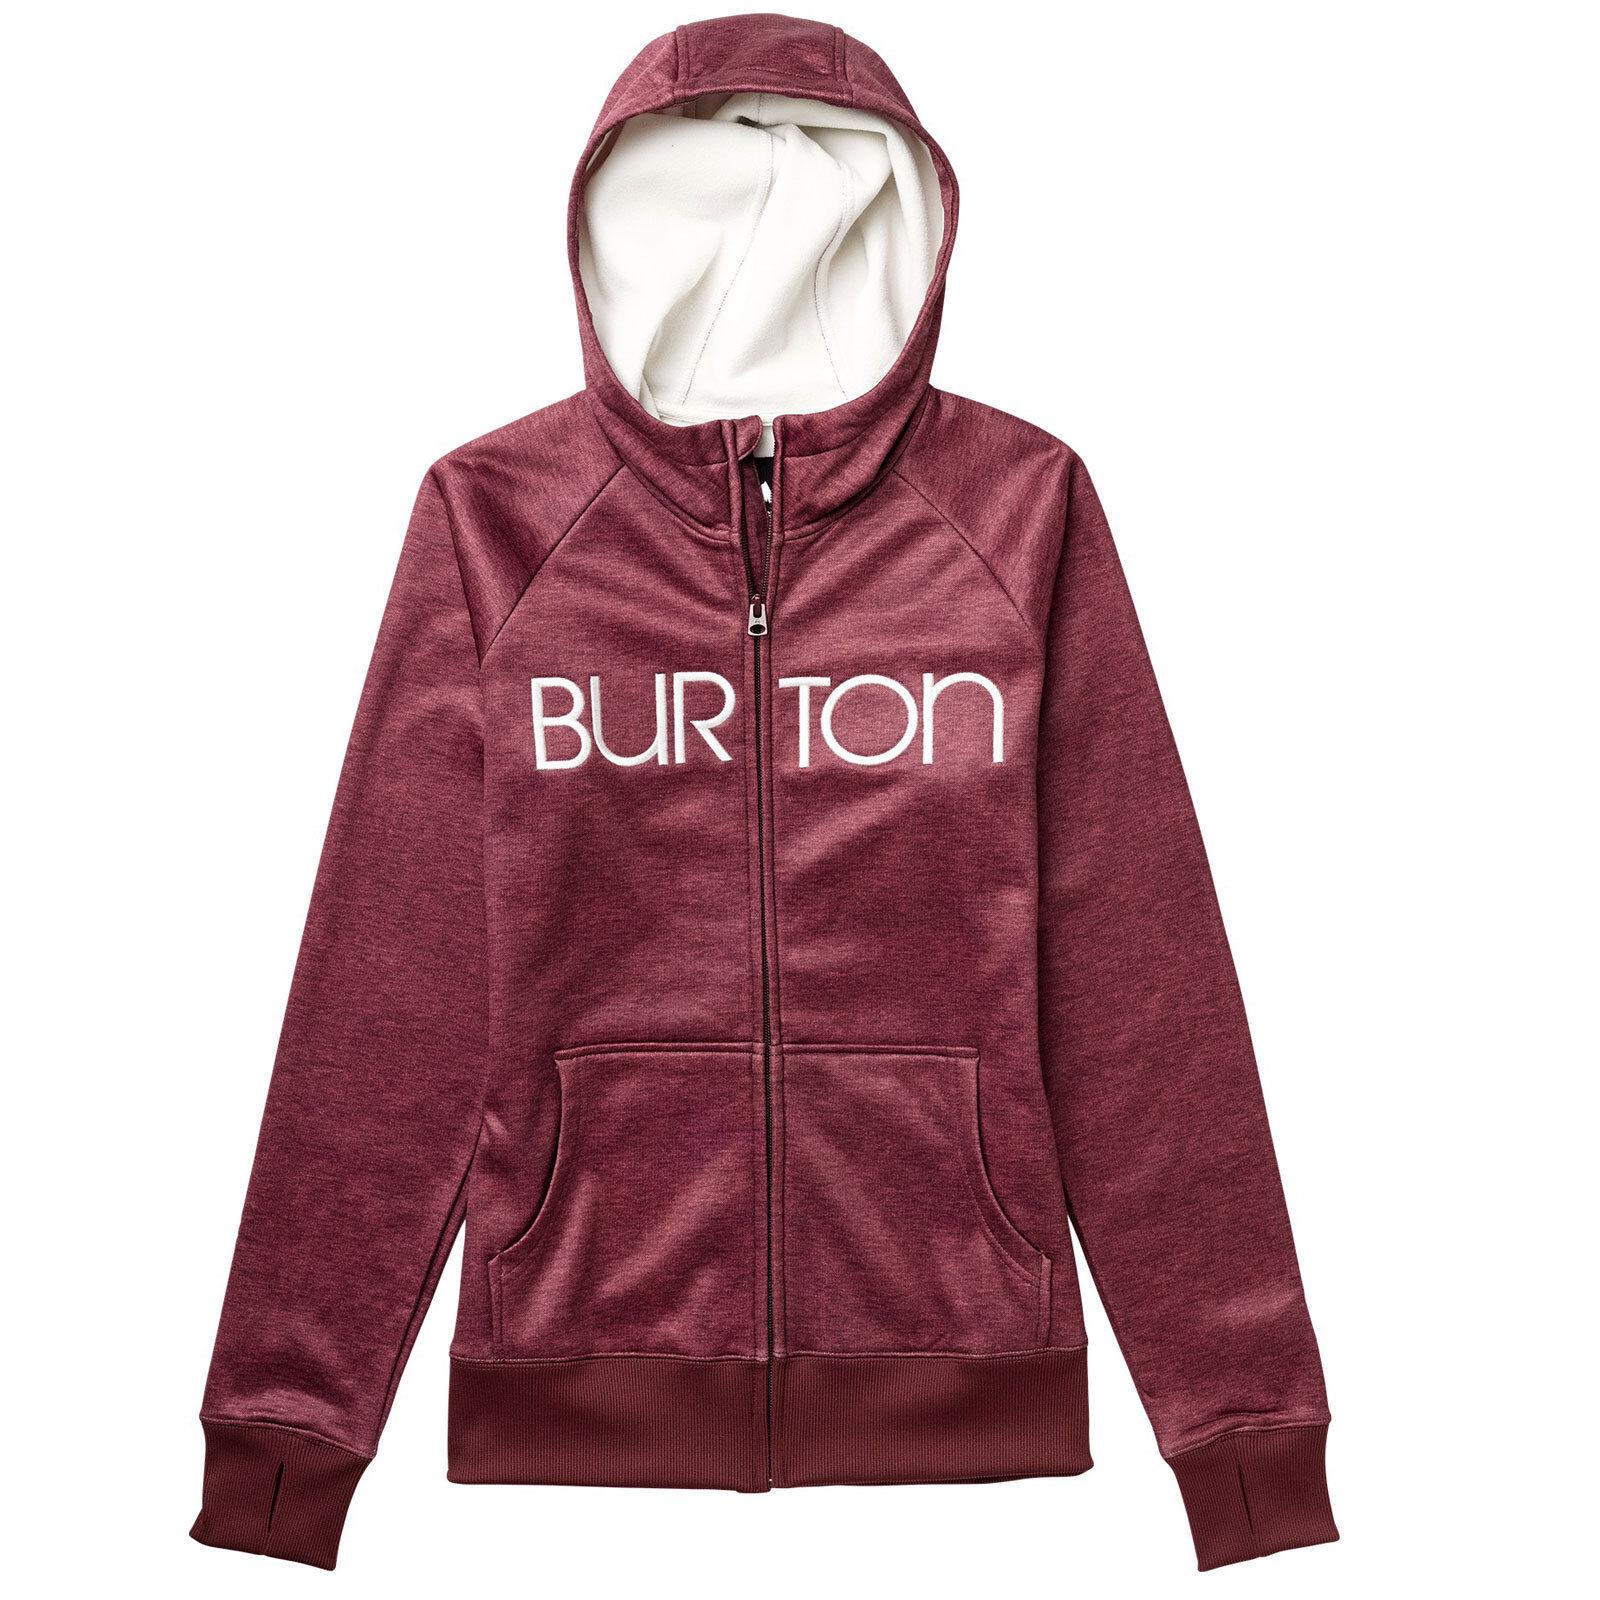 Burton Scoop Hoody Hoodie Damen Jacke Freizeitjacke Kapuzenjacke Zipjacke